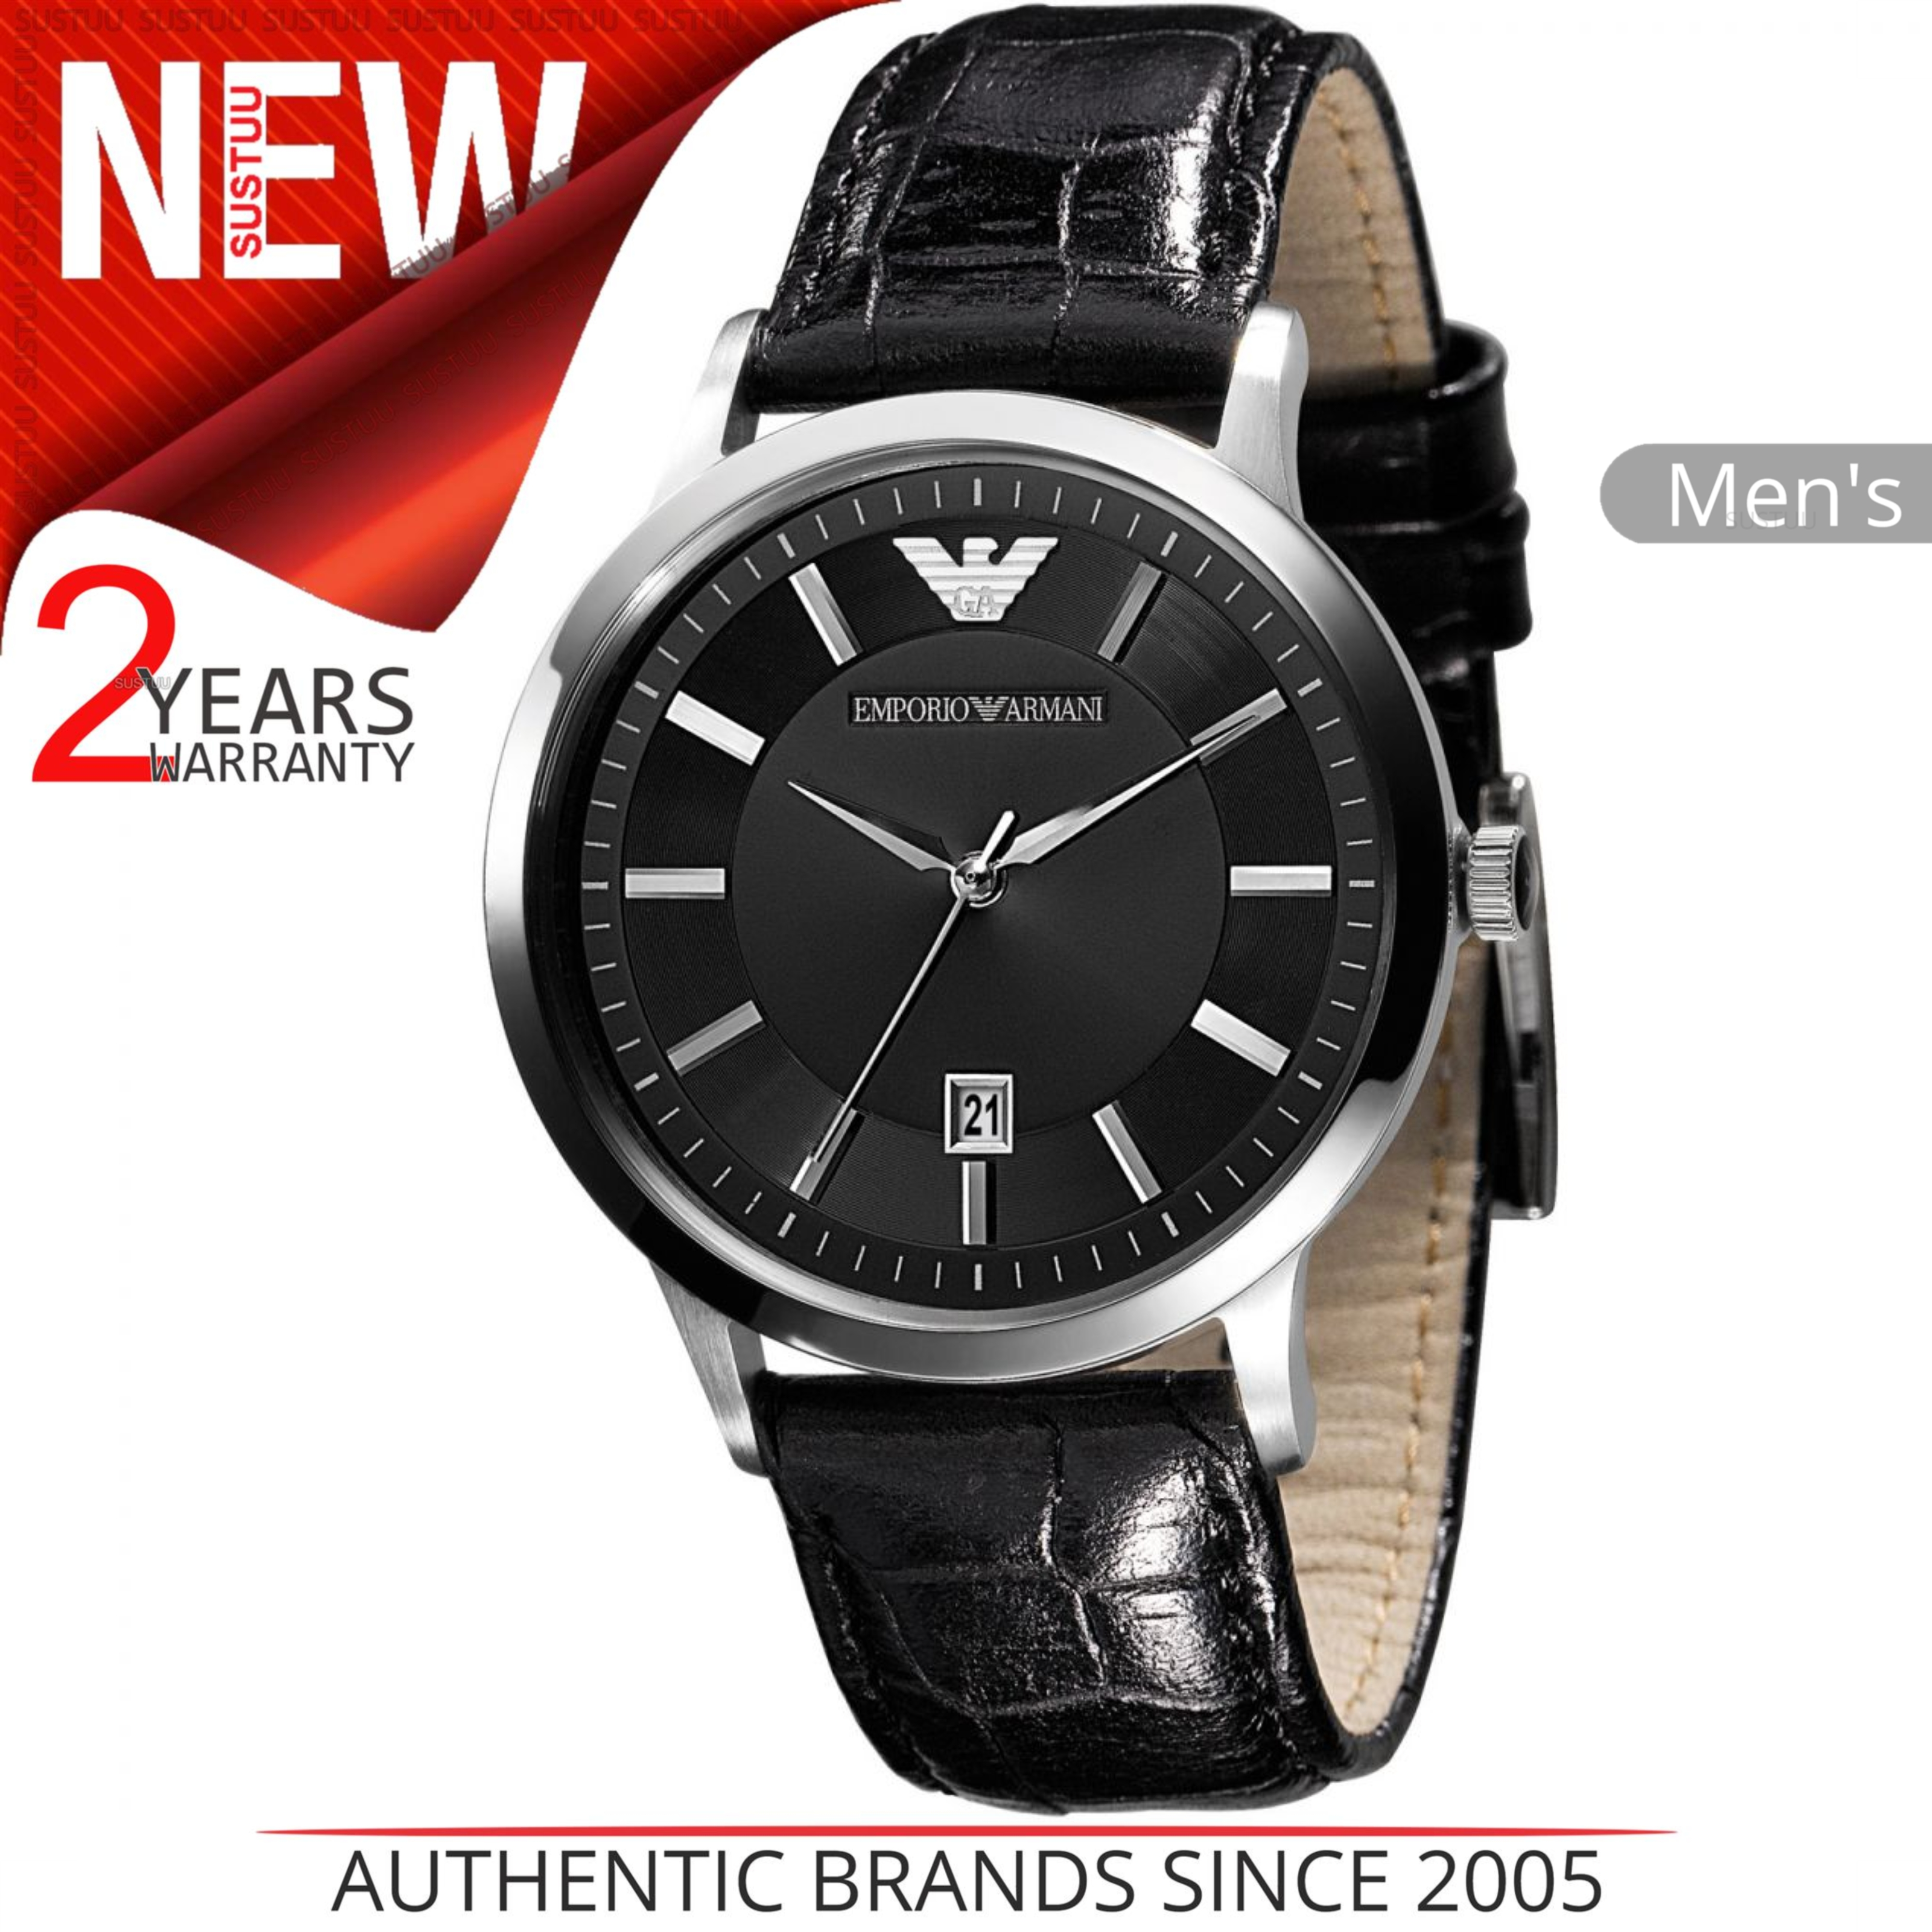 1ba244942195 Sentinel Emporio Armani Classic Men s Watch│Round Black Dial│Black Leather  Strap│AR2429. Sentinel Thumbnail 2